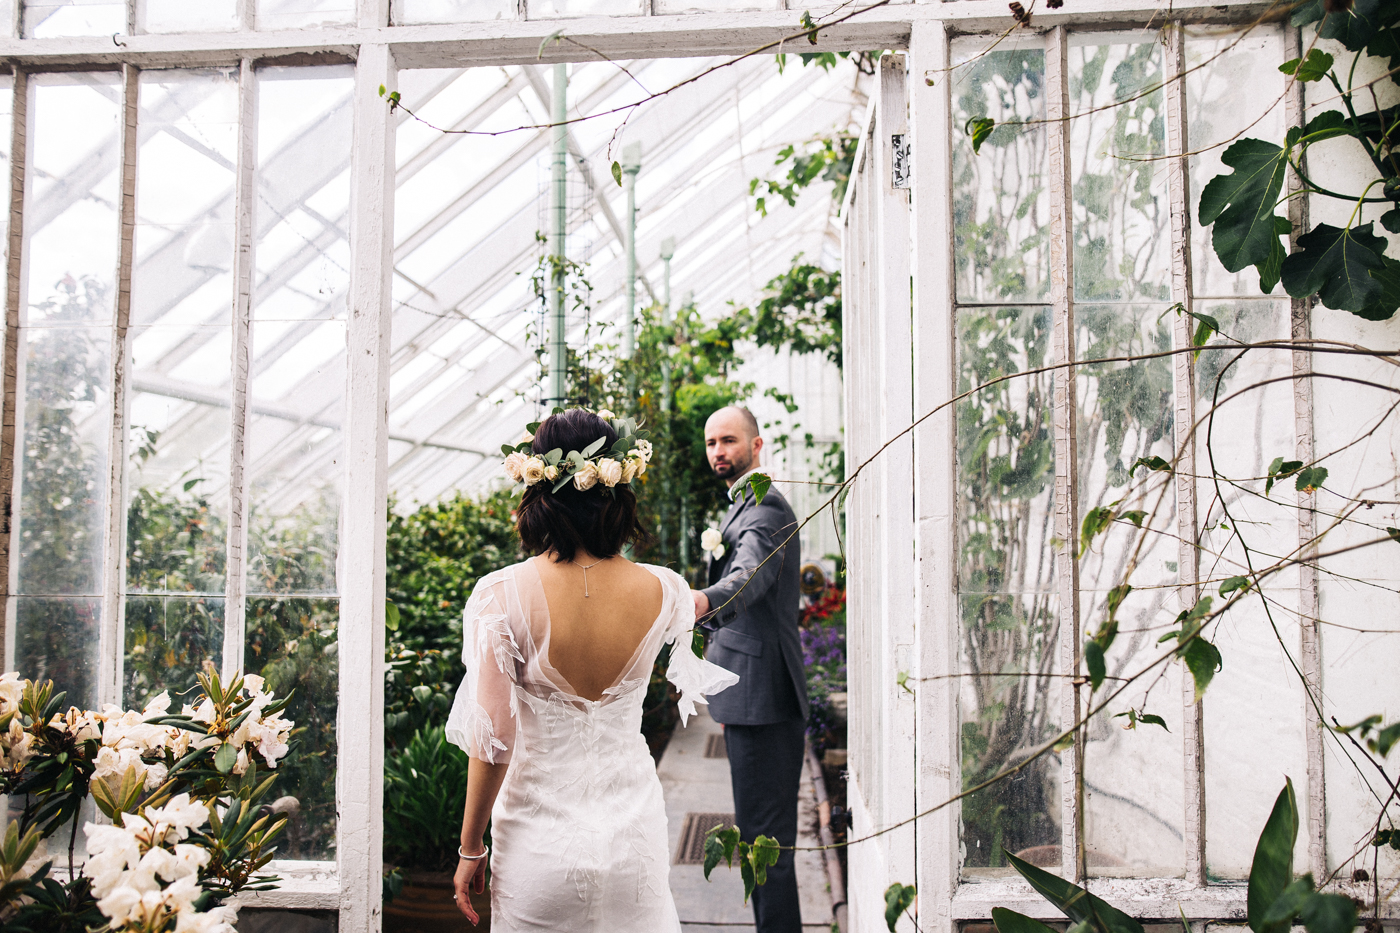 teesside-middlesbrough-north-east-wedding-photographer-creative-wedding-venues-0048.jpg